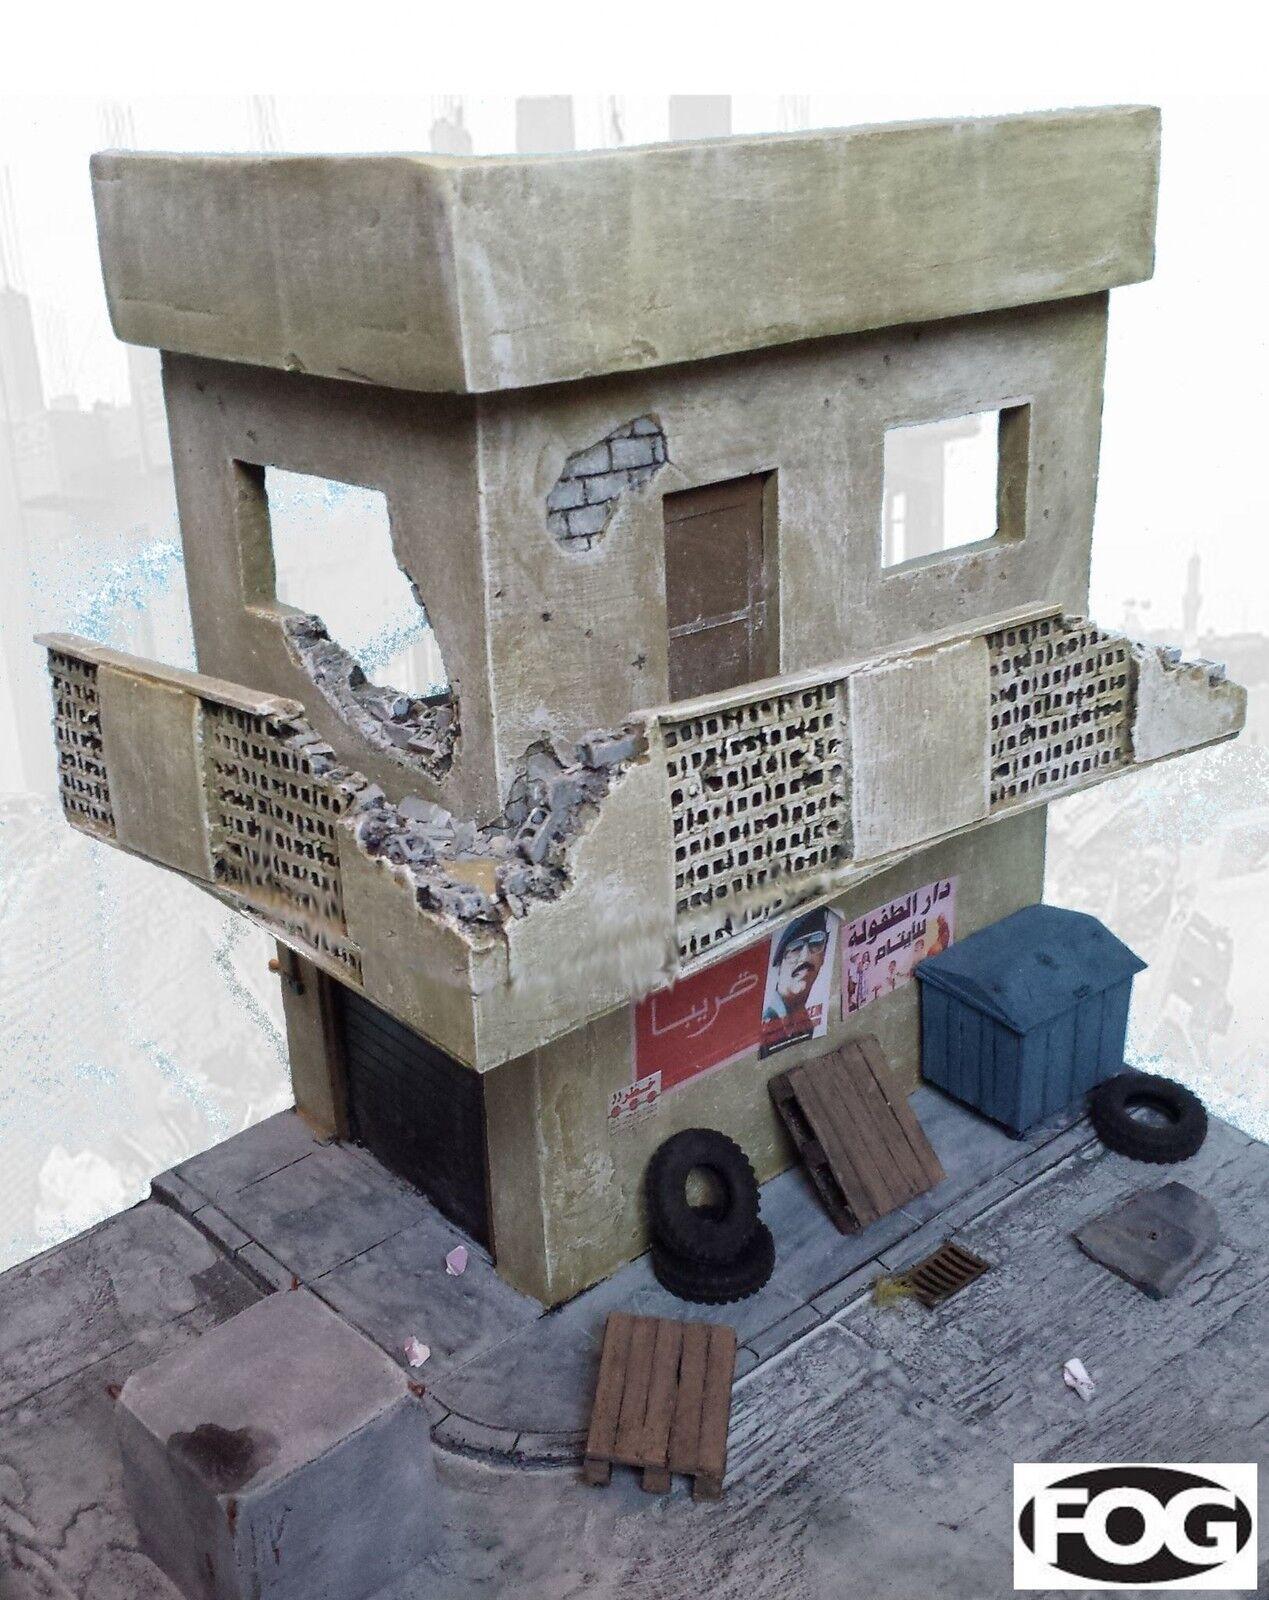 1 35 Scale  - 'Battle for Basra' Ceramic Diorama kit - Large display base